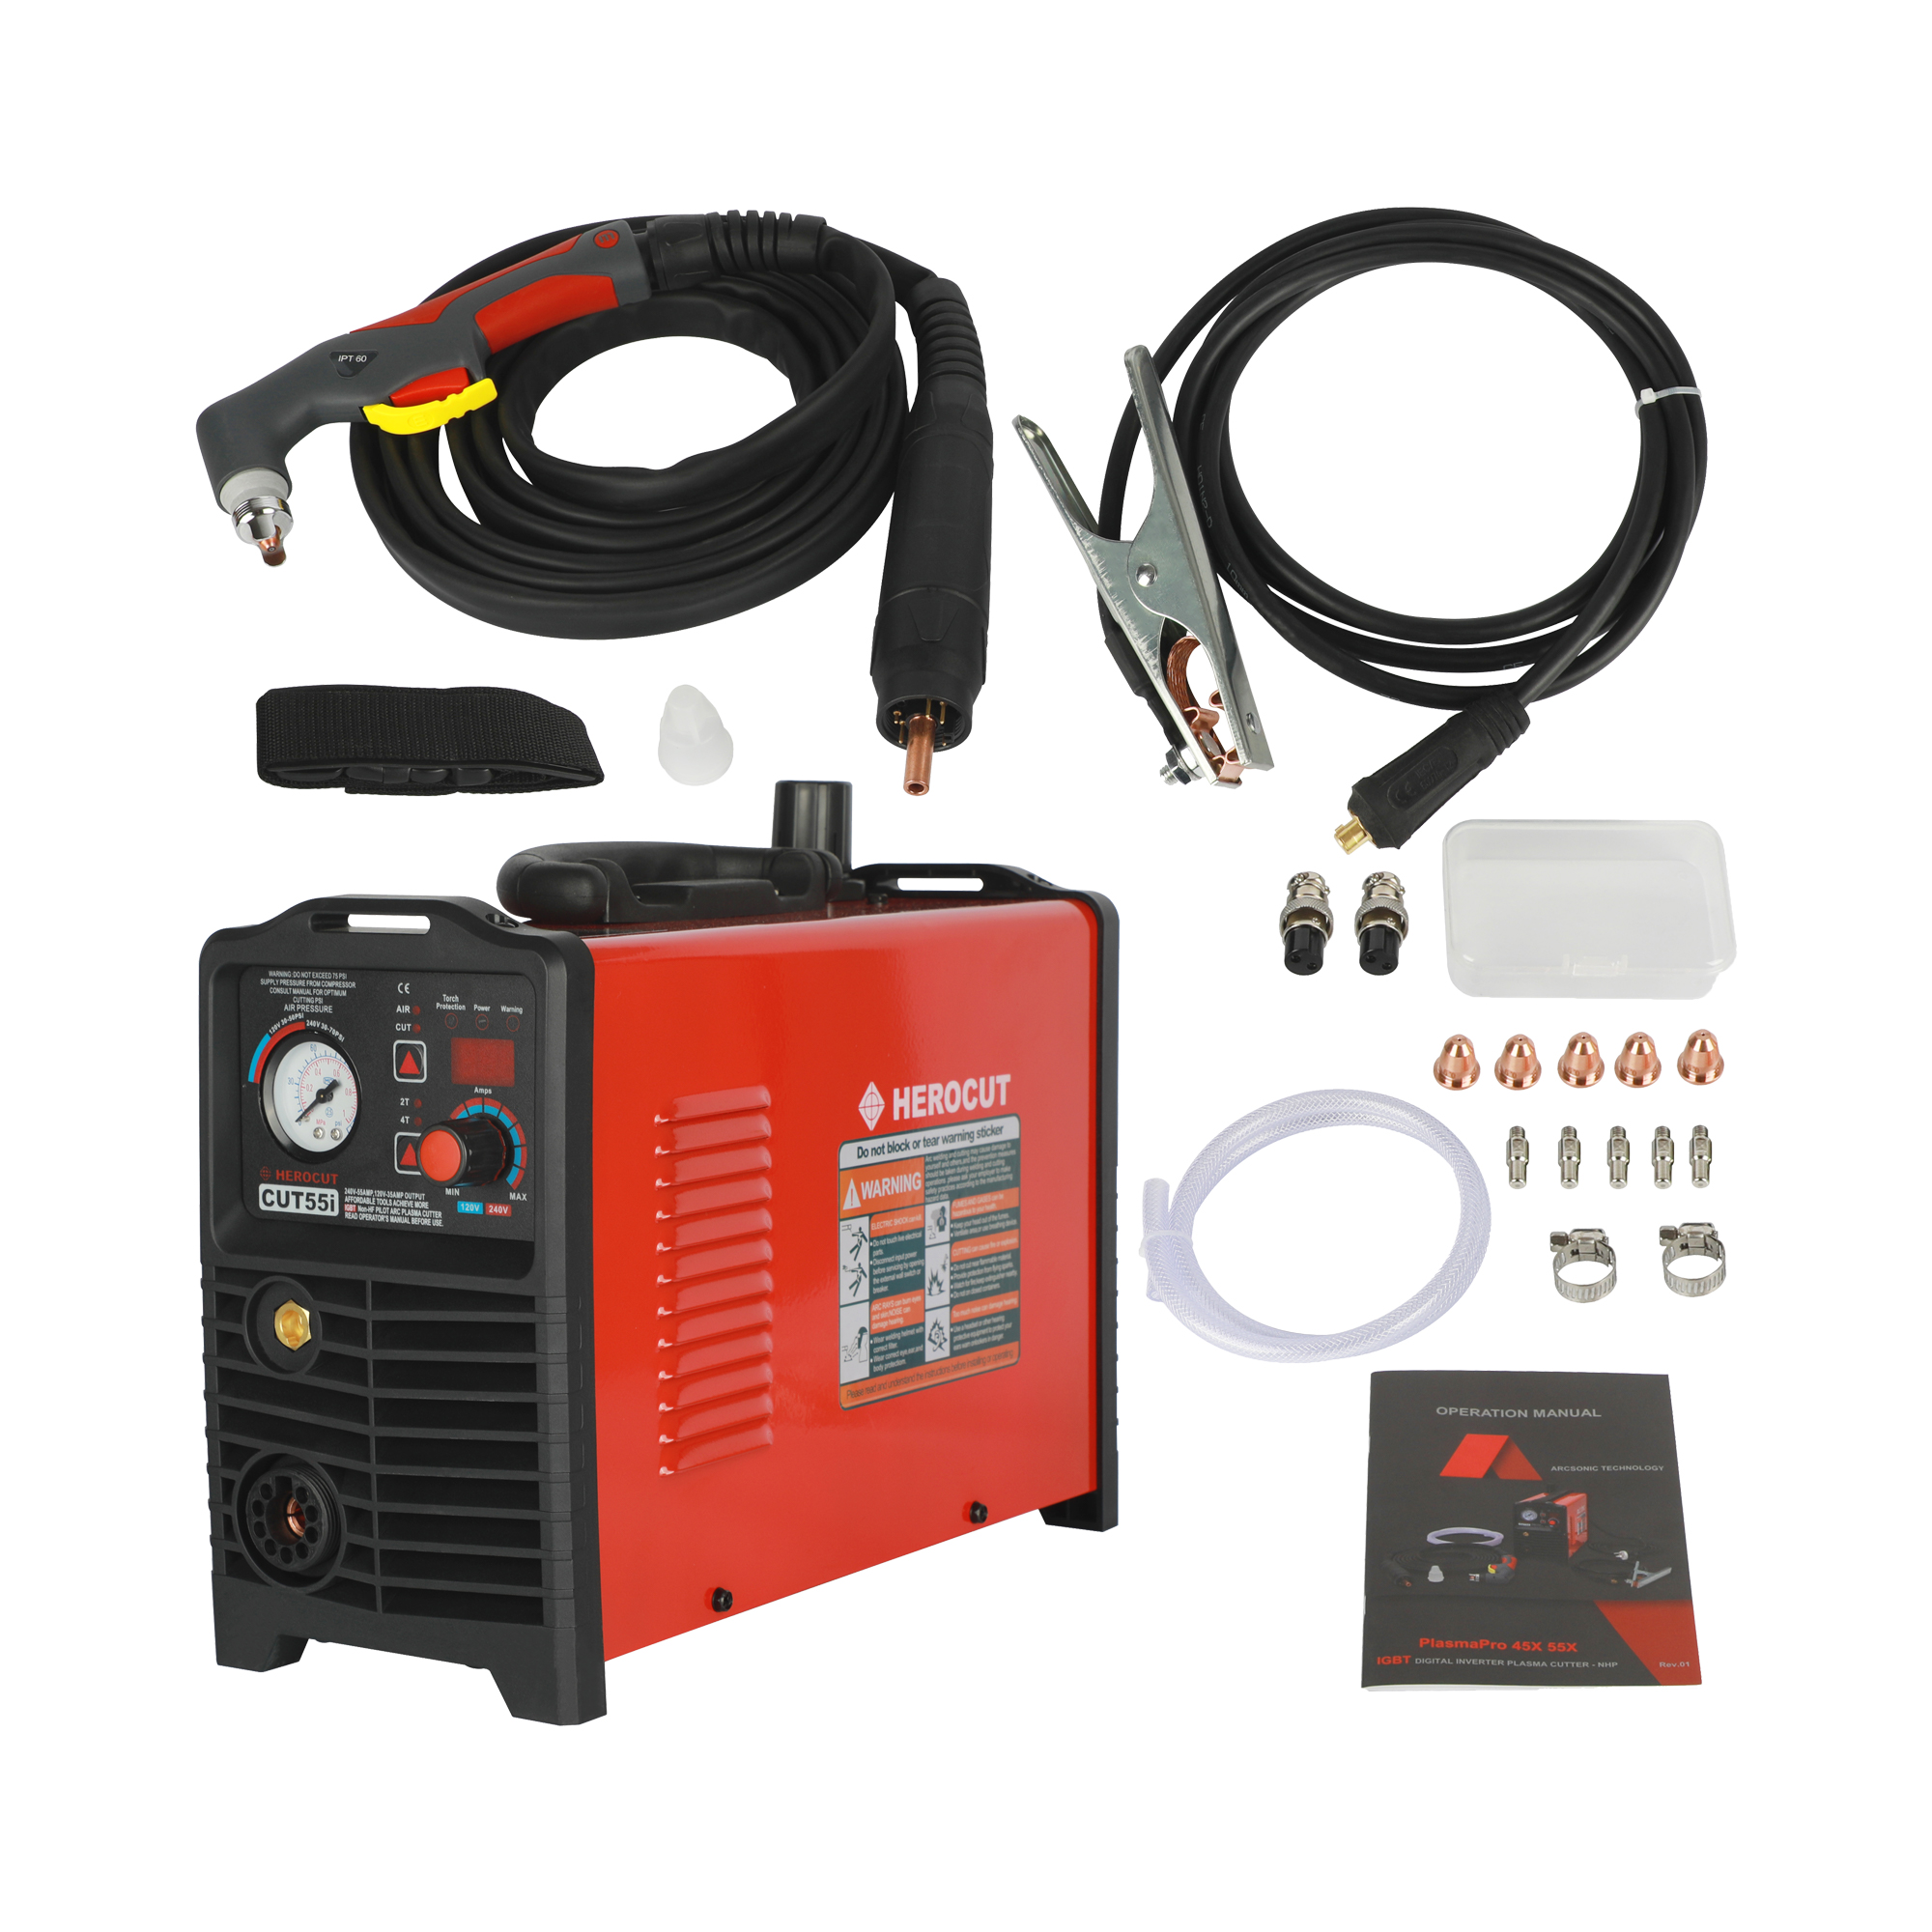 CNC IGBT Cut55i LCD Blow-back Non-HF Pilot Arc Plasma Cutting machine Voltage 120V 240V plasma cutter CNC